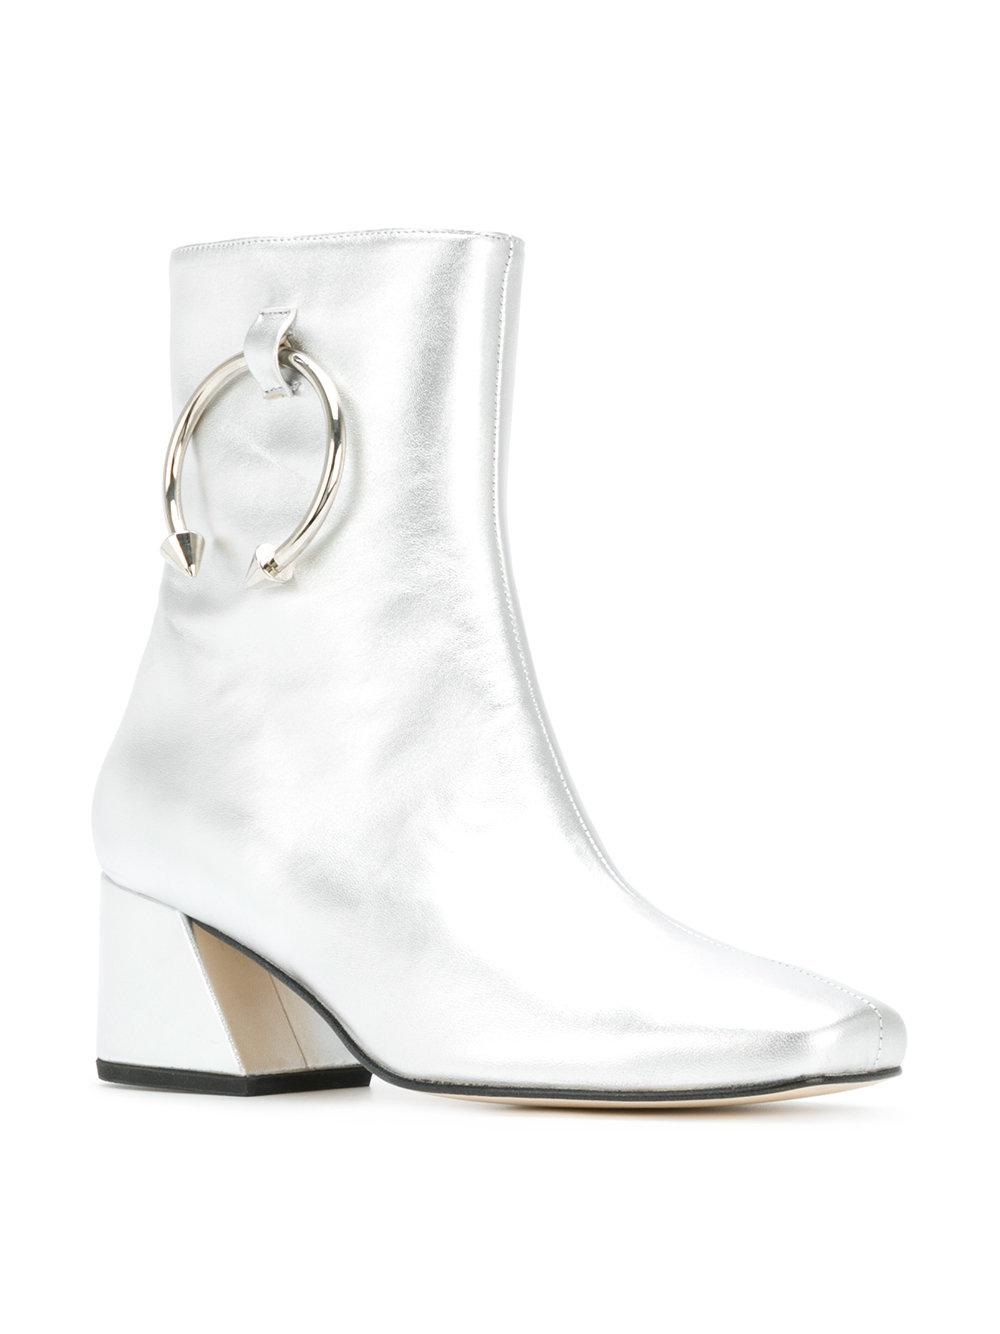 Dorateymur Leather Metallic Pierced Boots